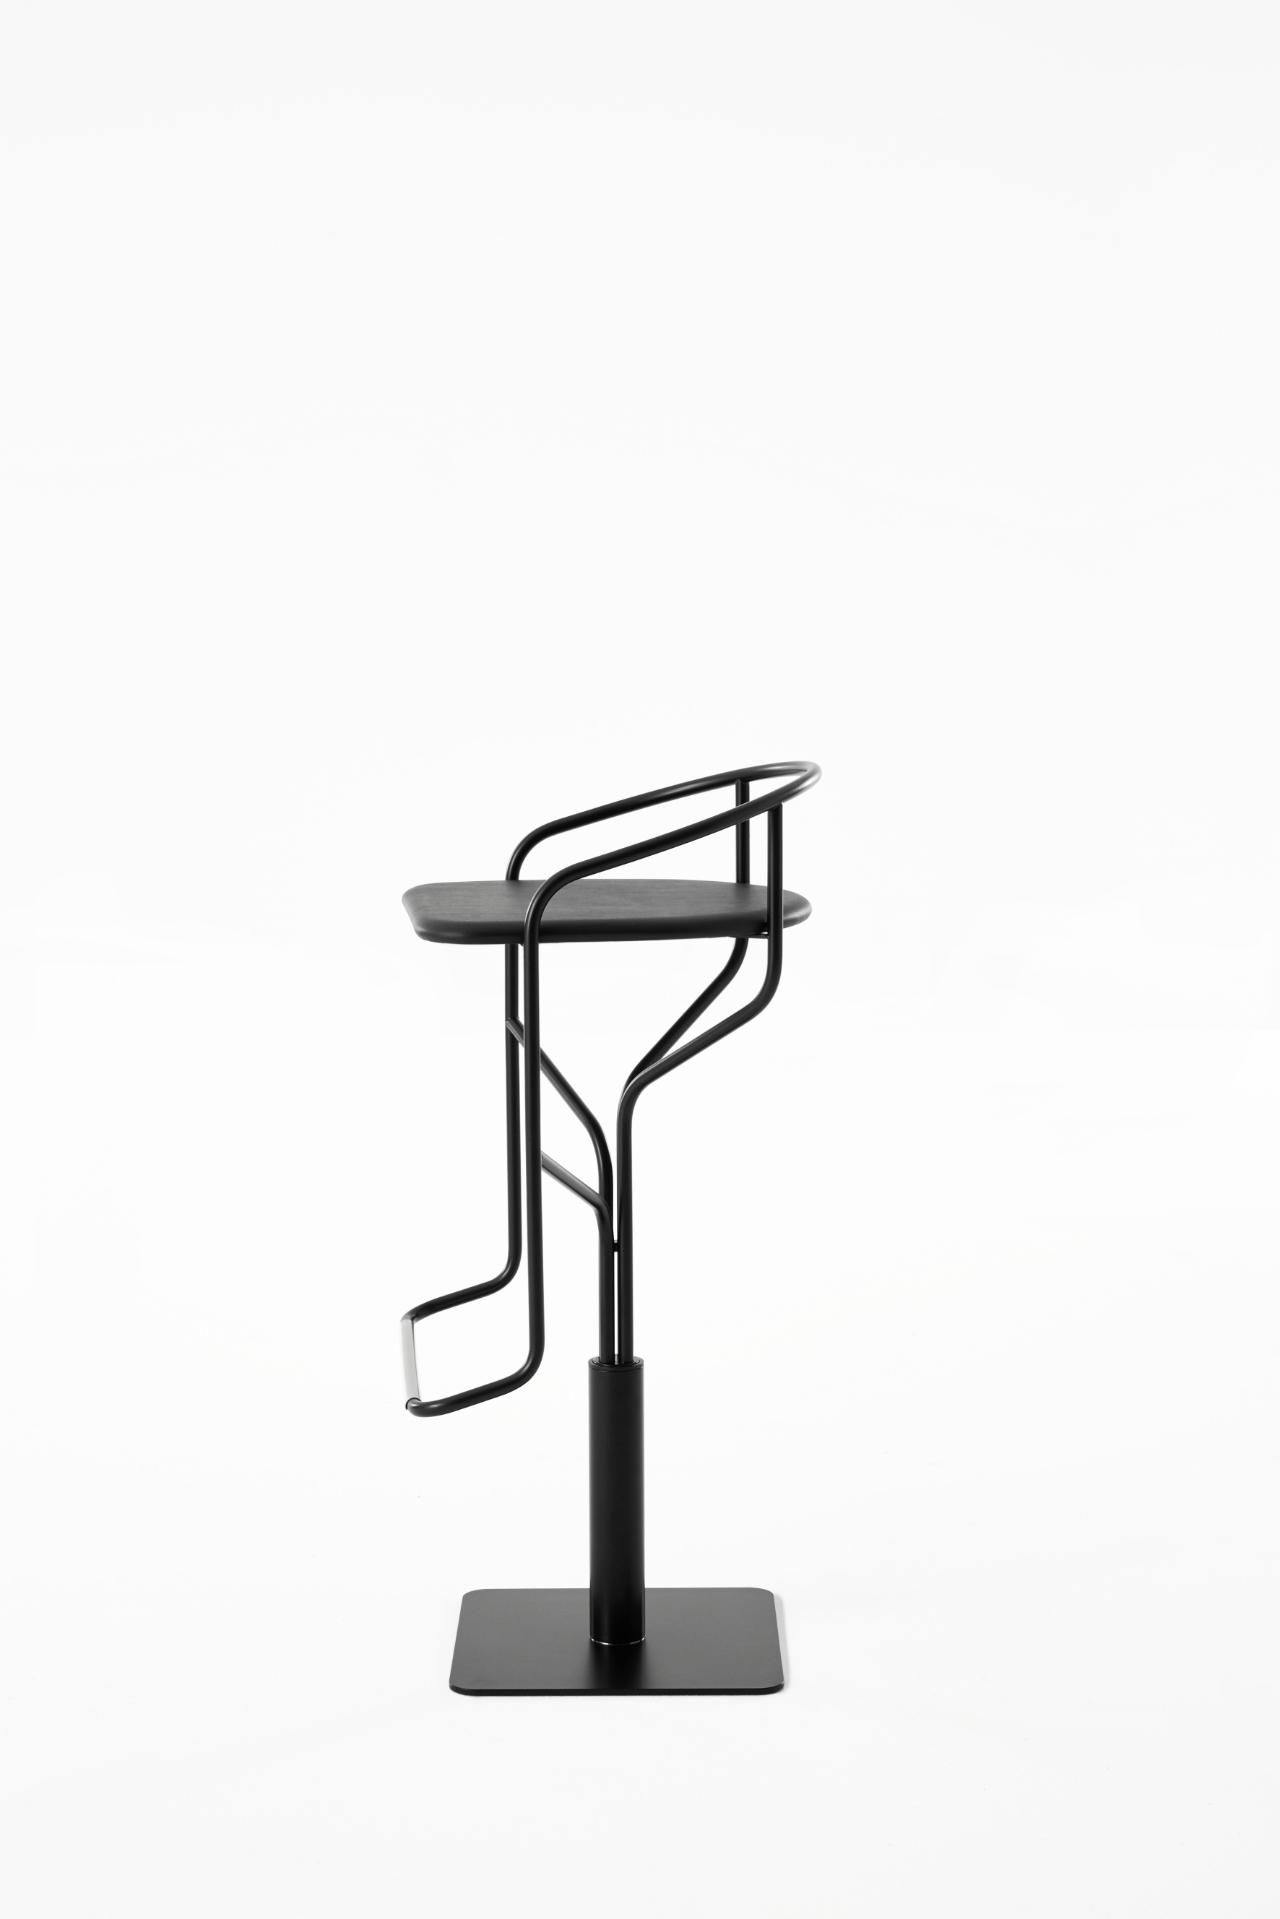 The Ike oriental-inspired collection, designed by Victor Vasilev. #interdema #furniture #designfurniture #homefurniture #contractfurniture #design #Desalto #VictorVasilev #мебель #мебельдлядома #дизайн #дизайнерскаямебель